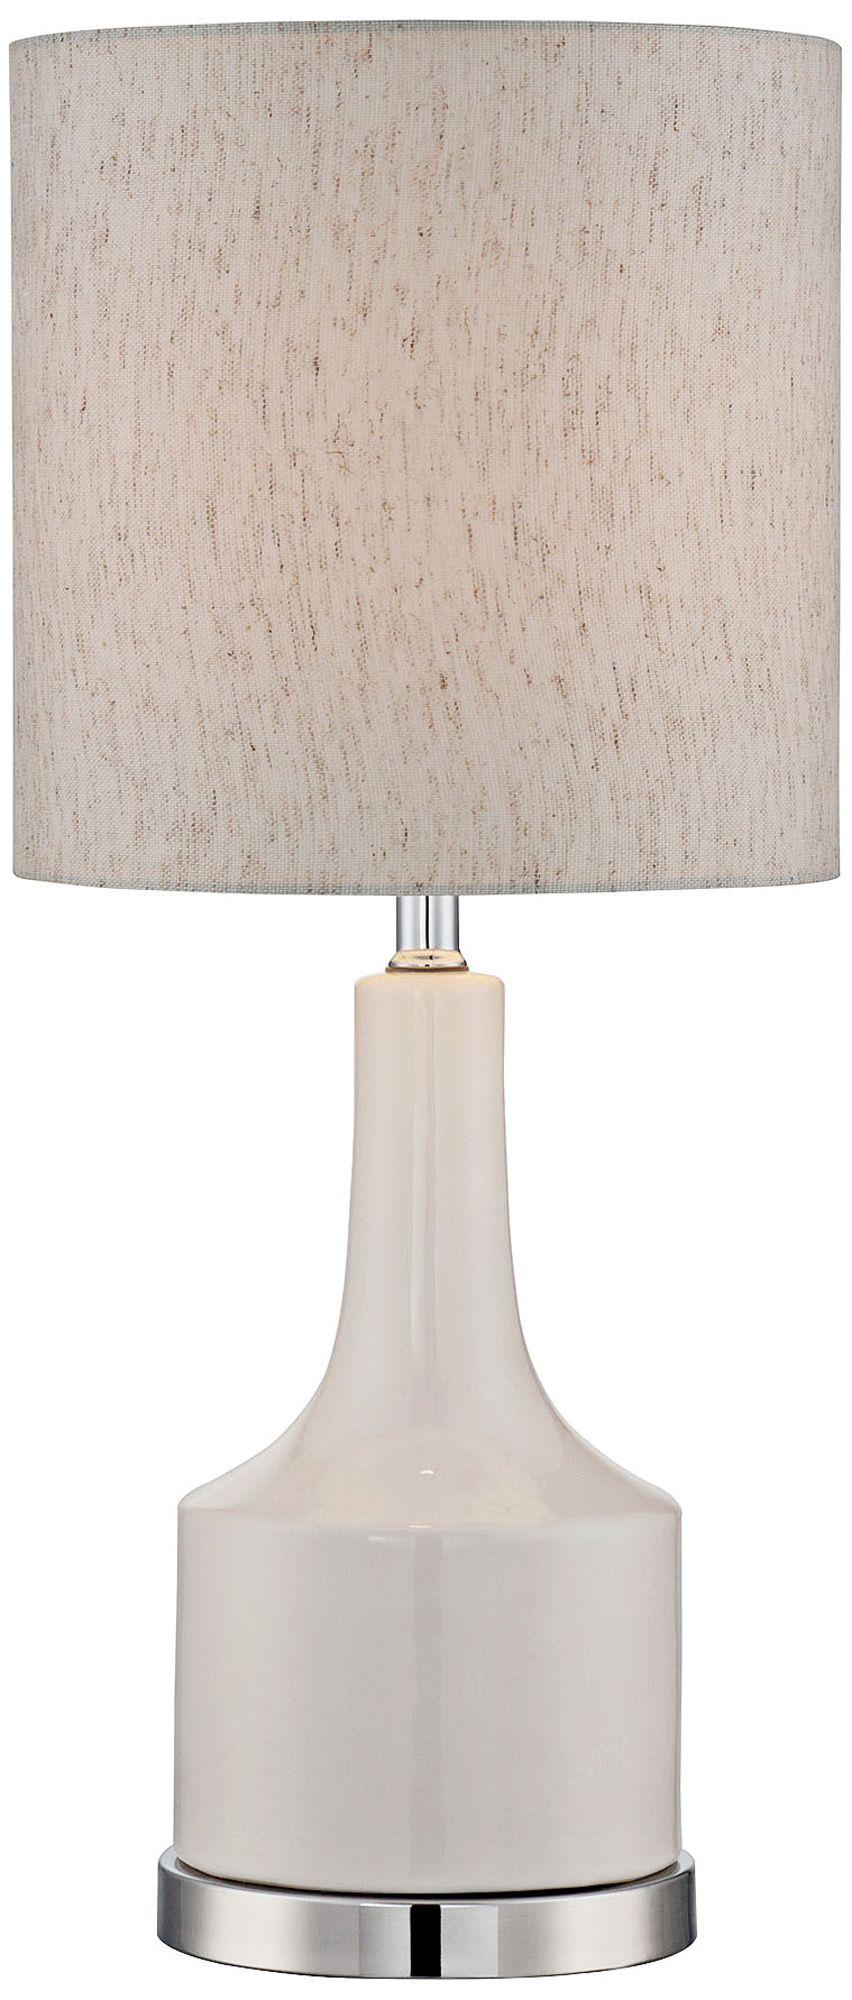 Lite Source White Ceramic Table Lamp